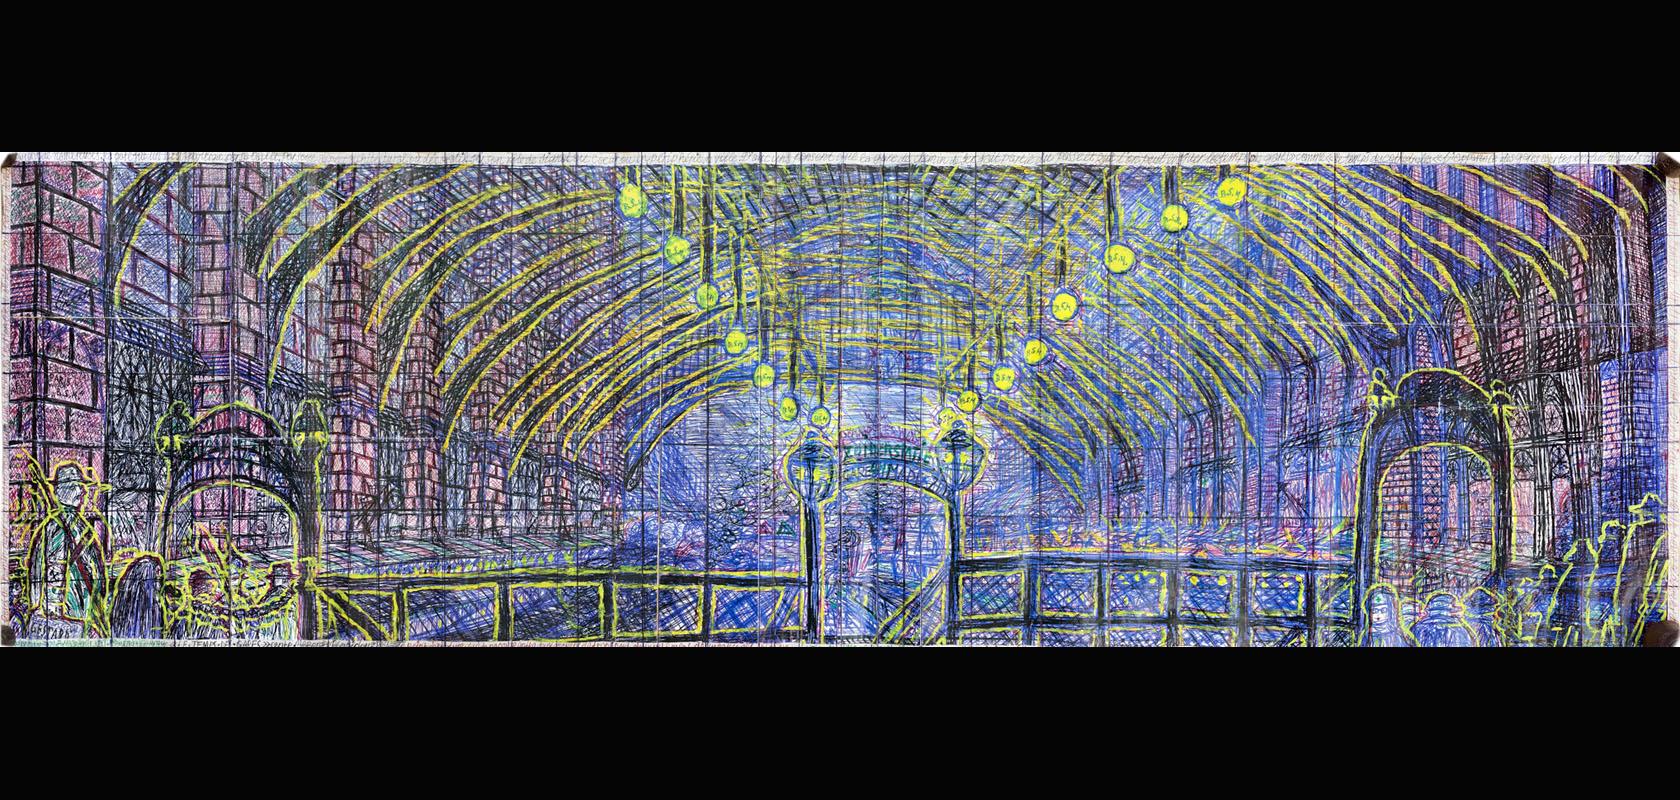 Bruxelles-Central-Museum-Charlotte-Zander-slide2